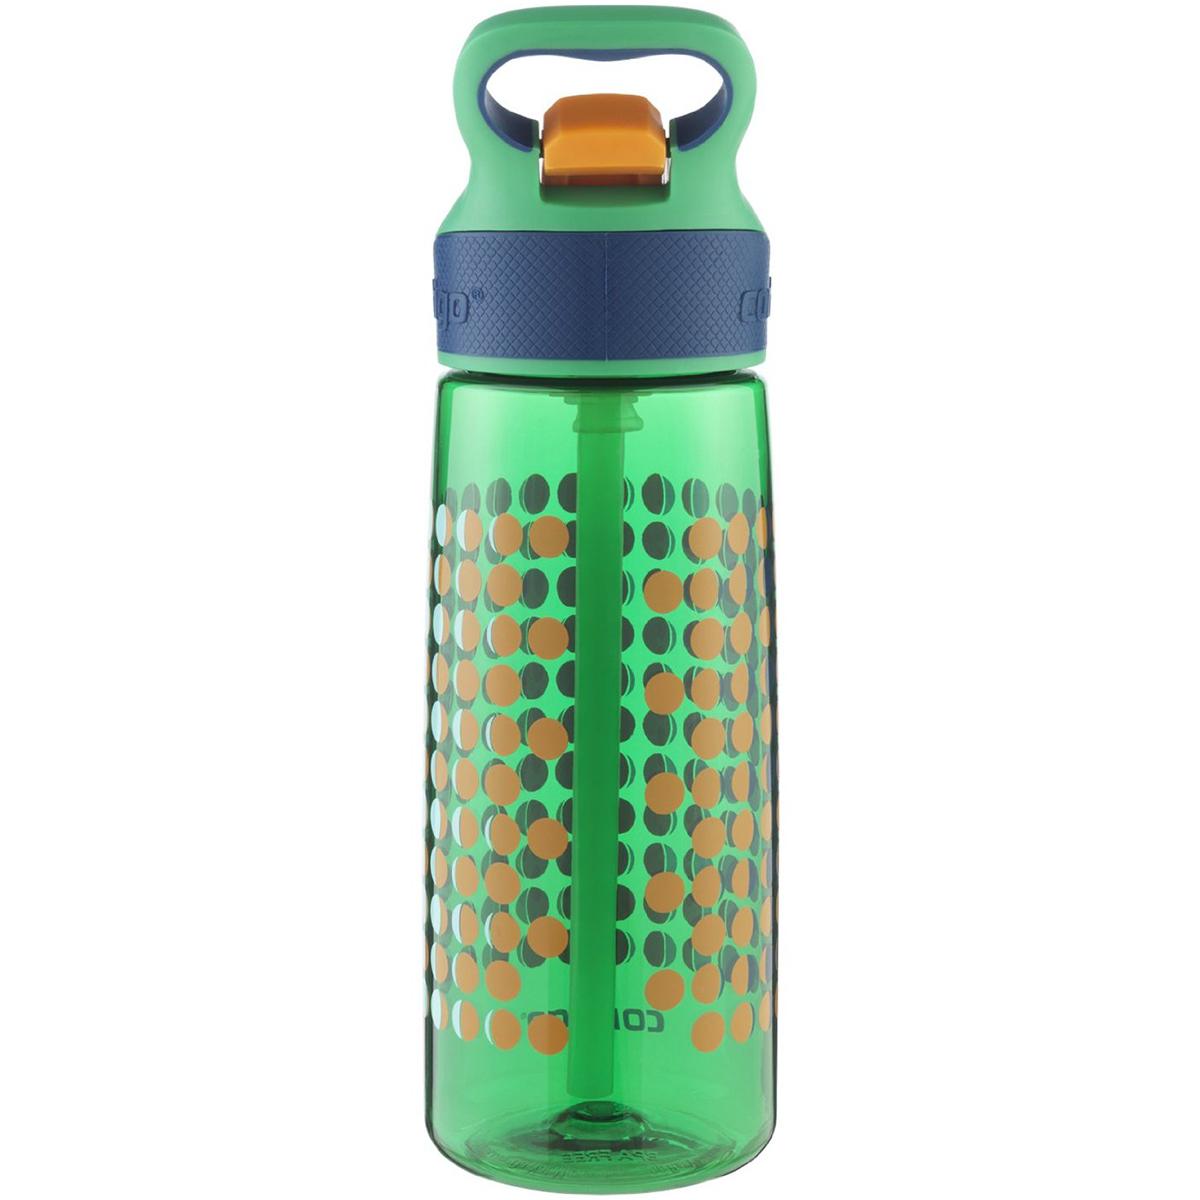 Contigo-20-oz-Kid-039-s-Striker-Autospout-Water-Bottle miniatuur 5